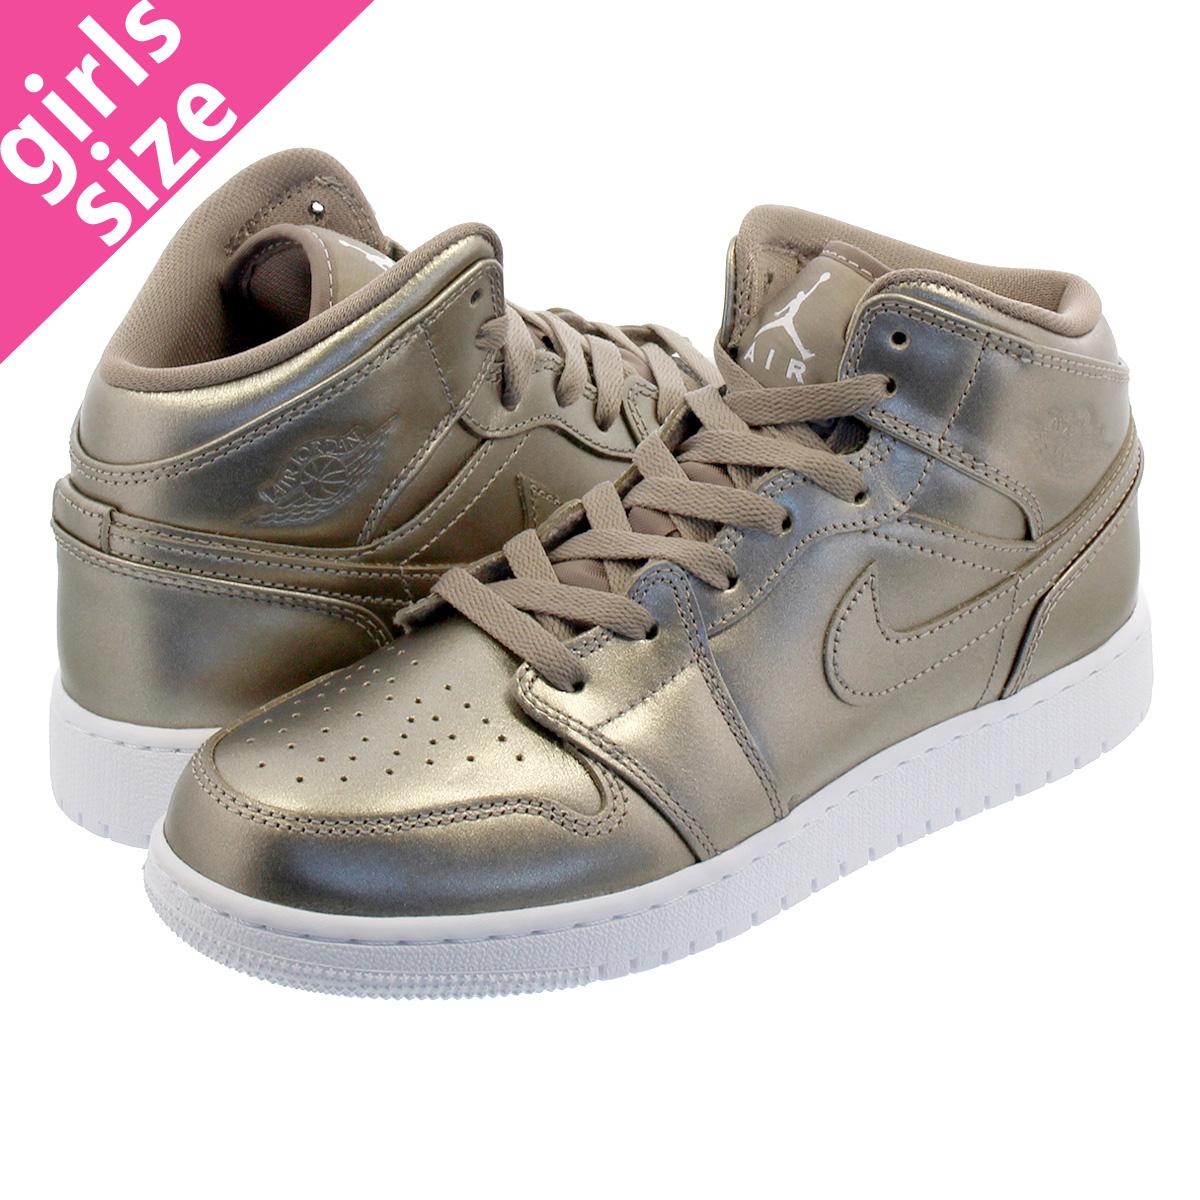 3cd58268f410b6 NIKE AIR JORDAN 1 MID GS Nike Air Jordan 1 mid GS SEPIA STONE WHITE NOBLE  RED av5174-200